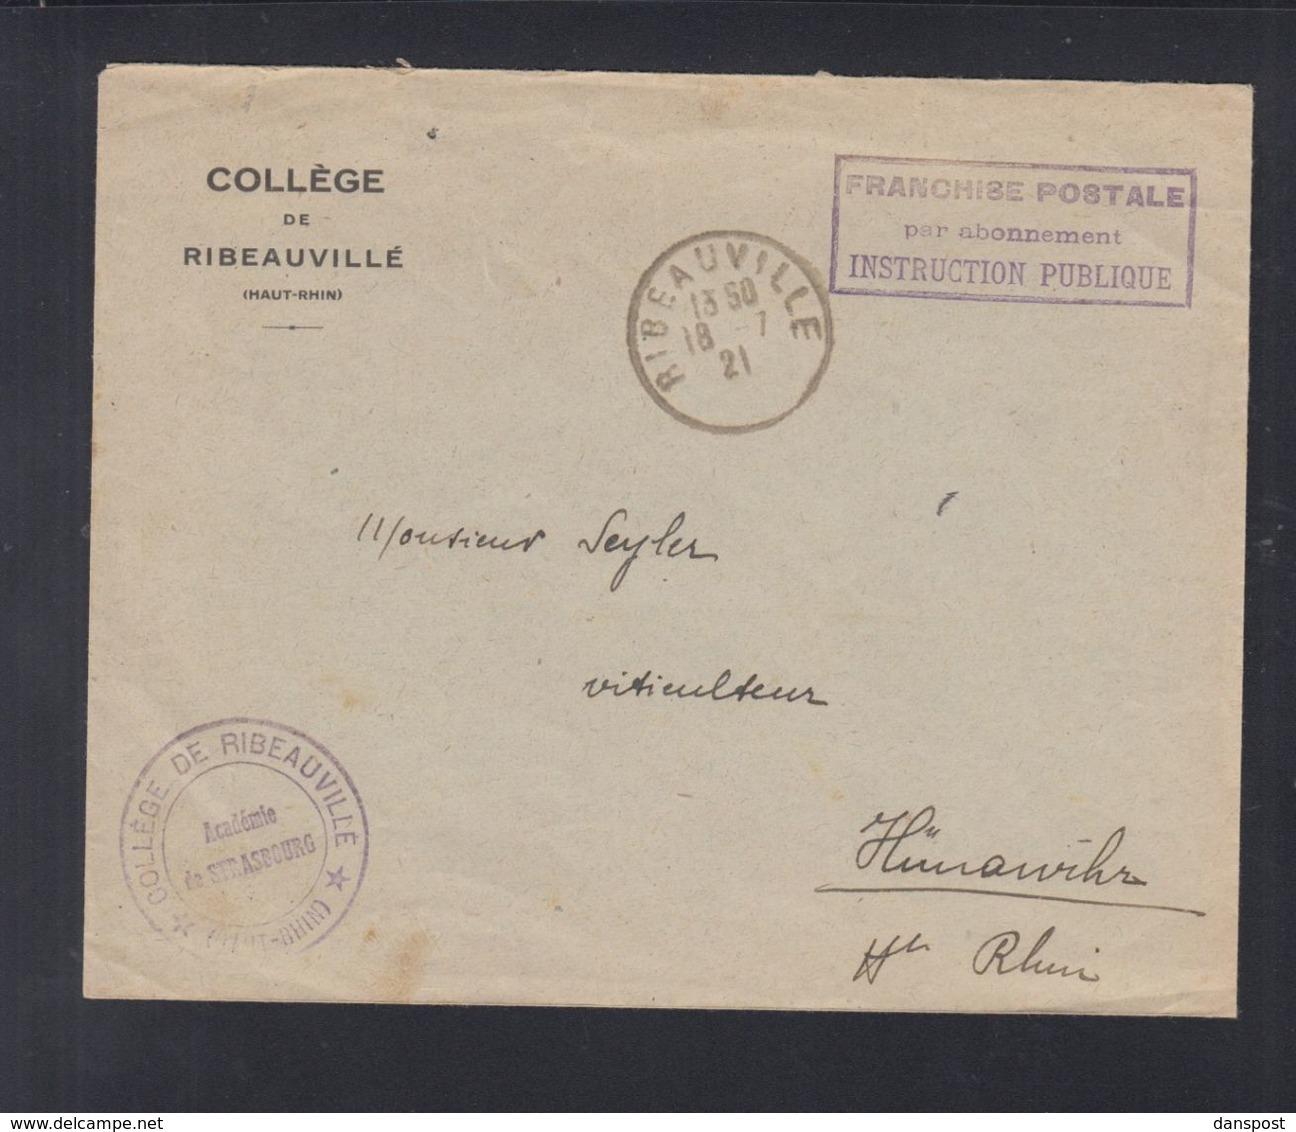 Frankreich France Brief Francise Postale Instruction Publique - Briefe U. Dokumente